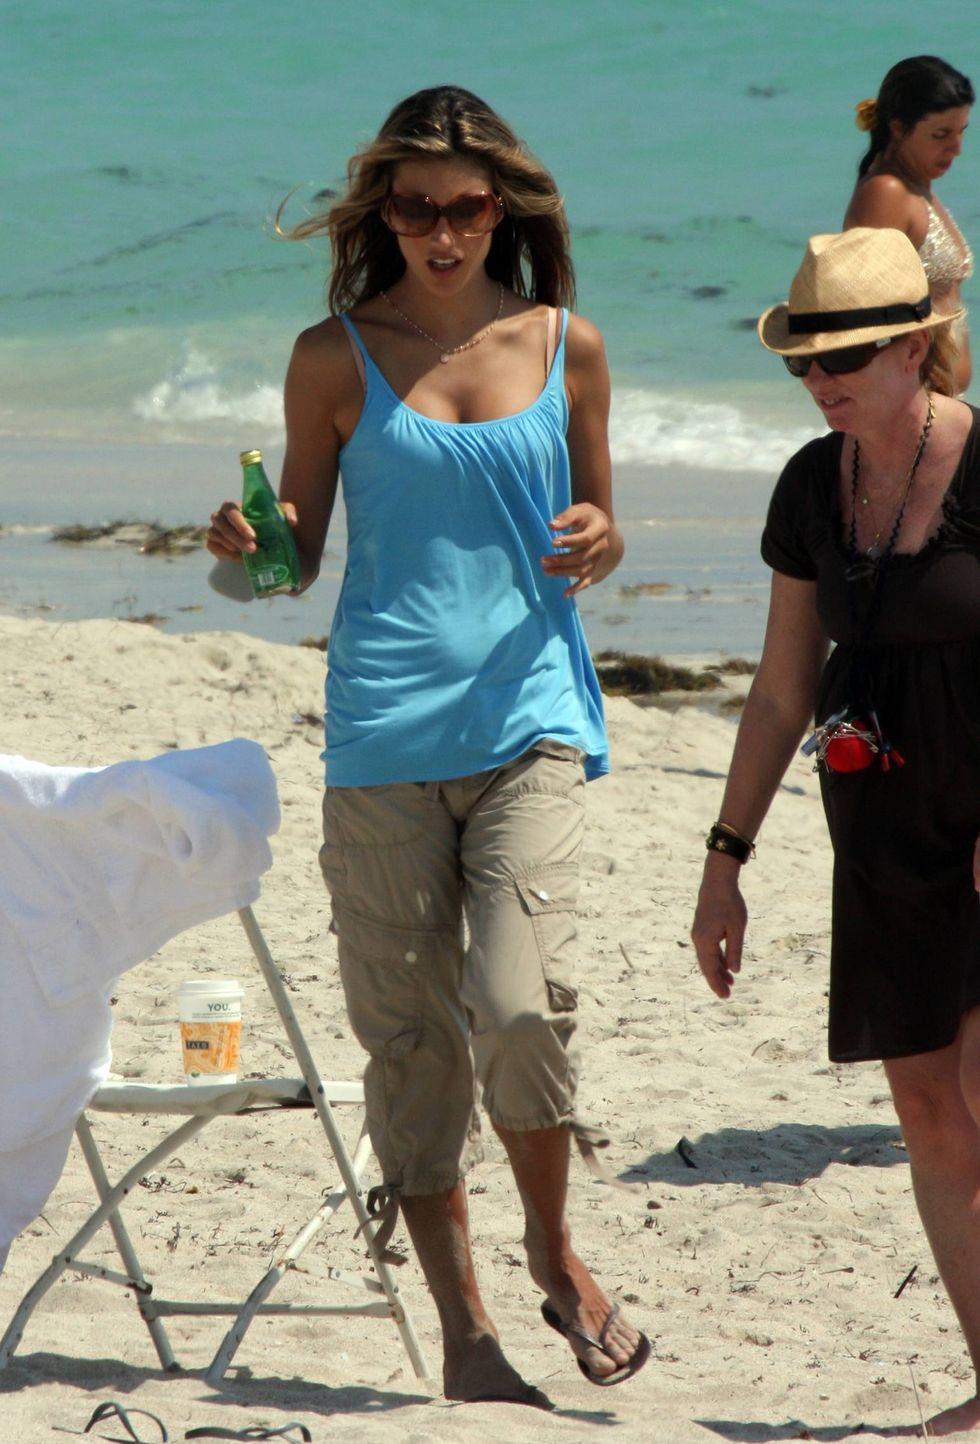 alessandra-ambrosio-photoshot-candids-on-the-beach-in-miami-01